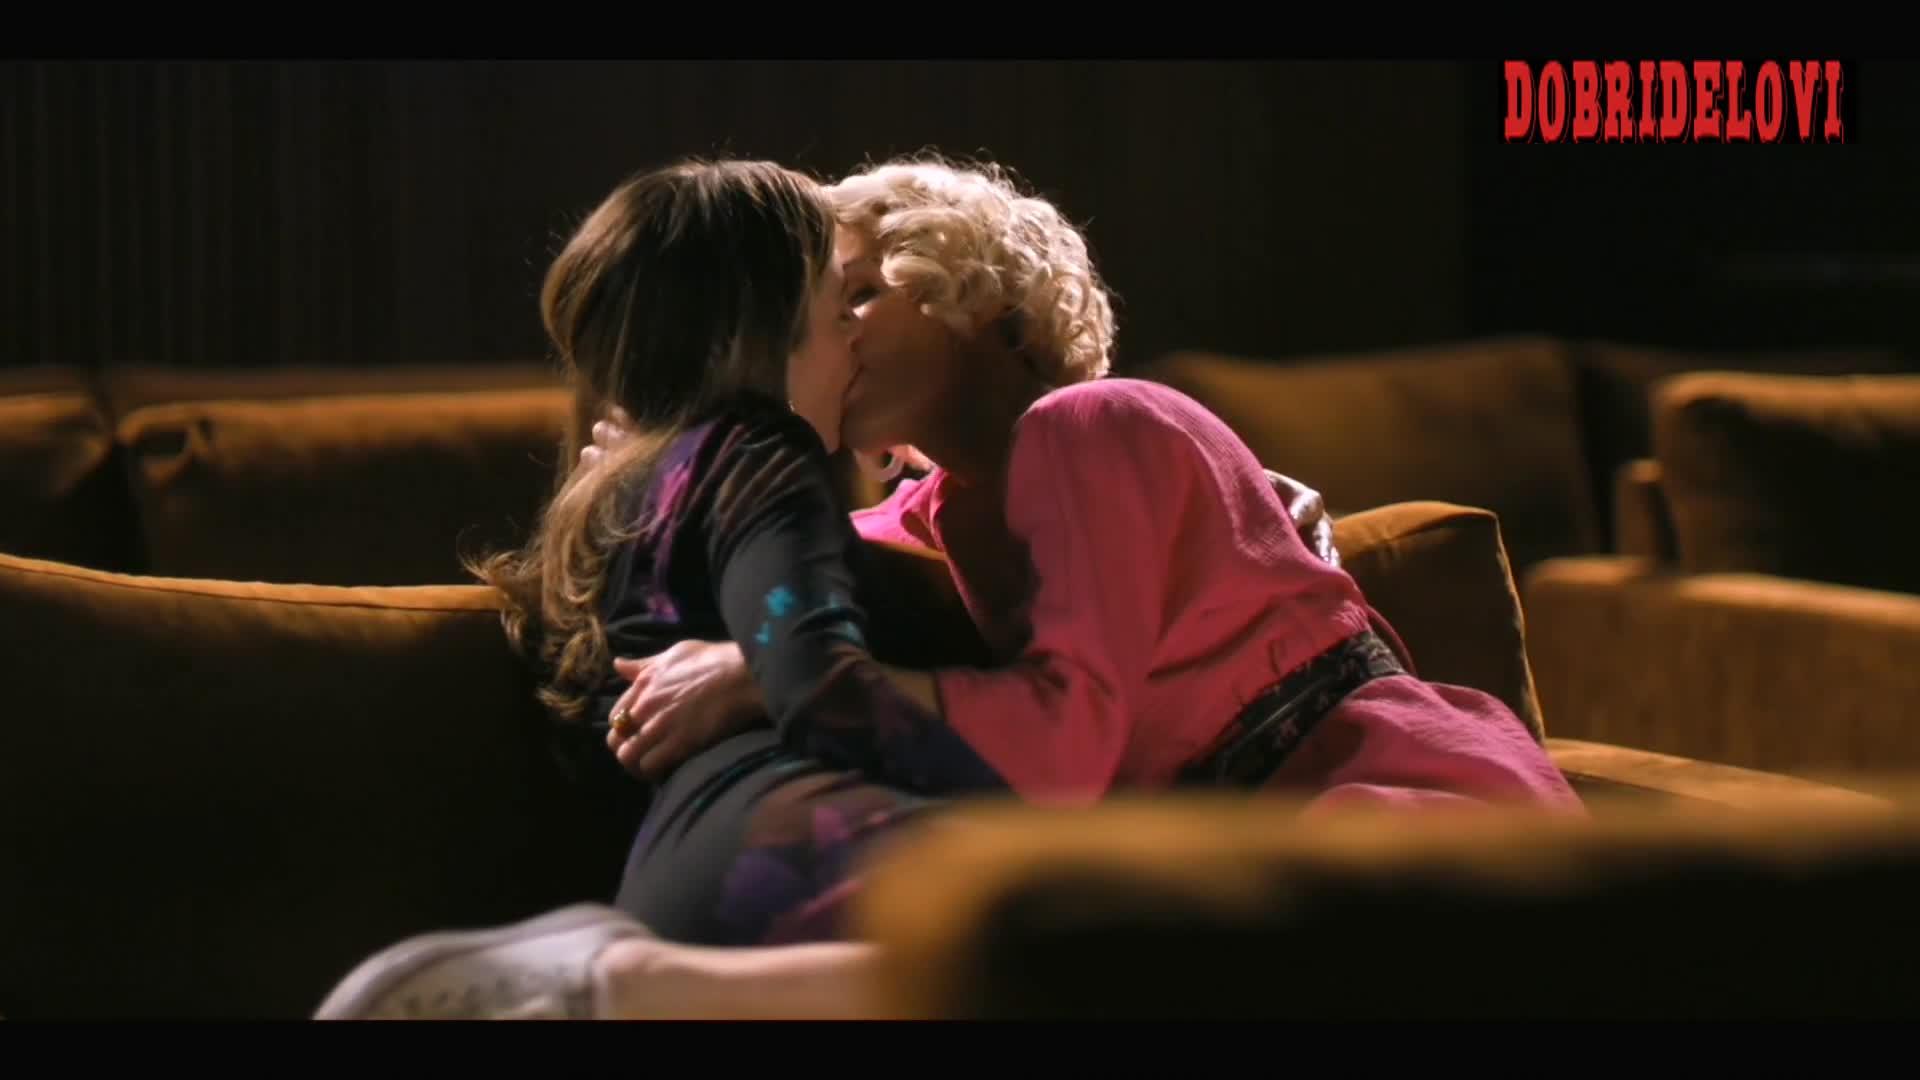 Stephanie Allynne and Leisha Hailey lesbian kiss in the couch scene